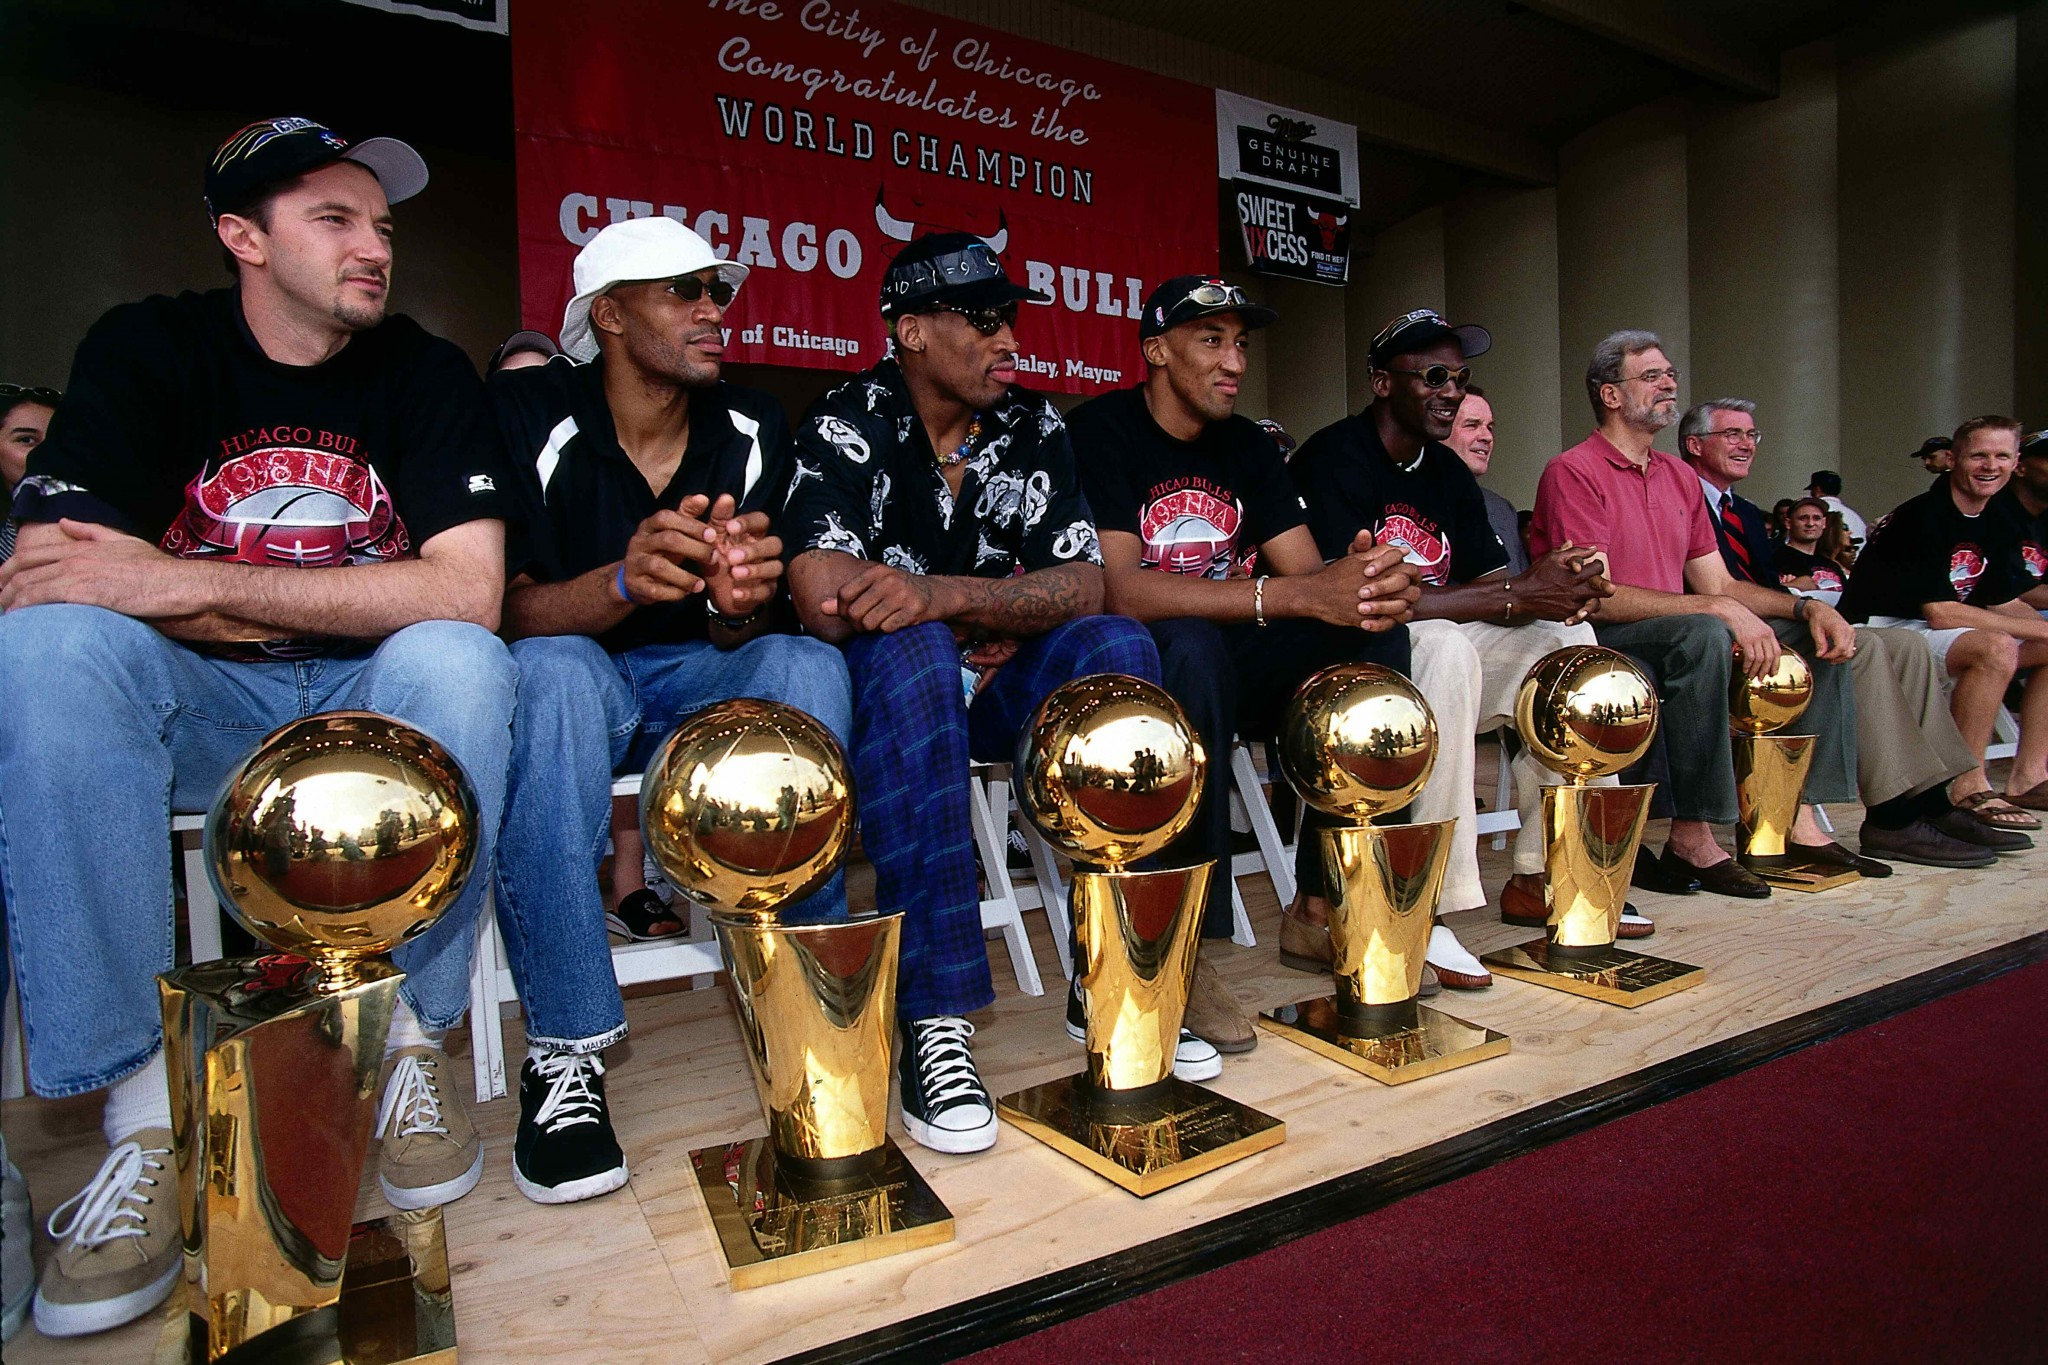 http://history.bulls.com/wp-content/uploads/2016/02/90s_trophies.jpg